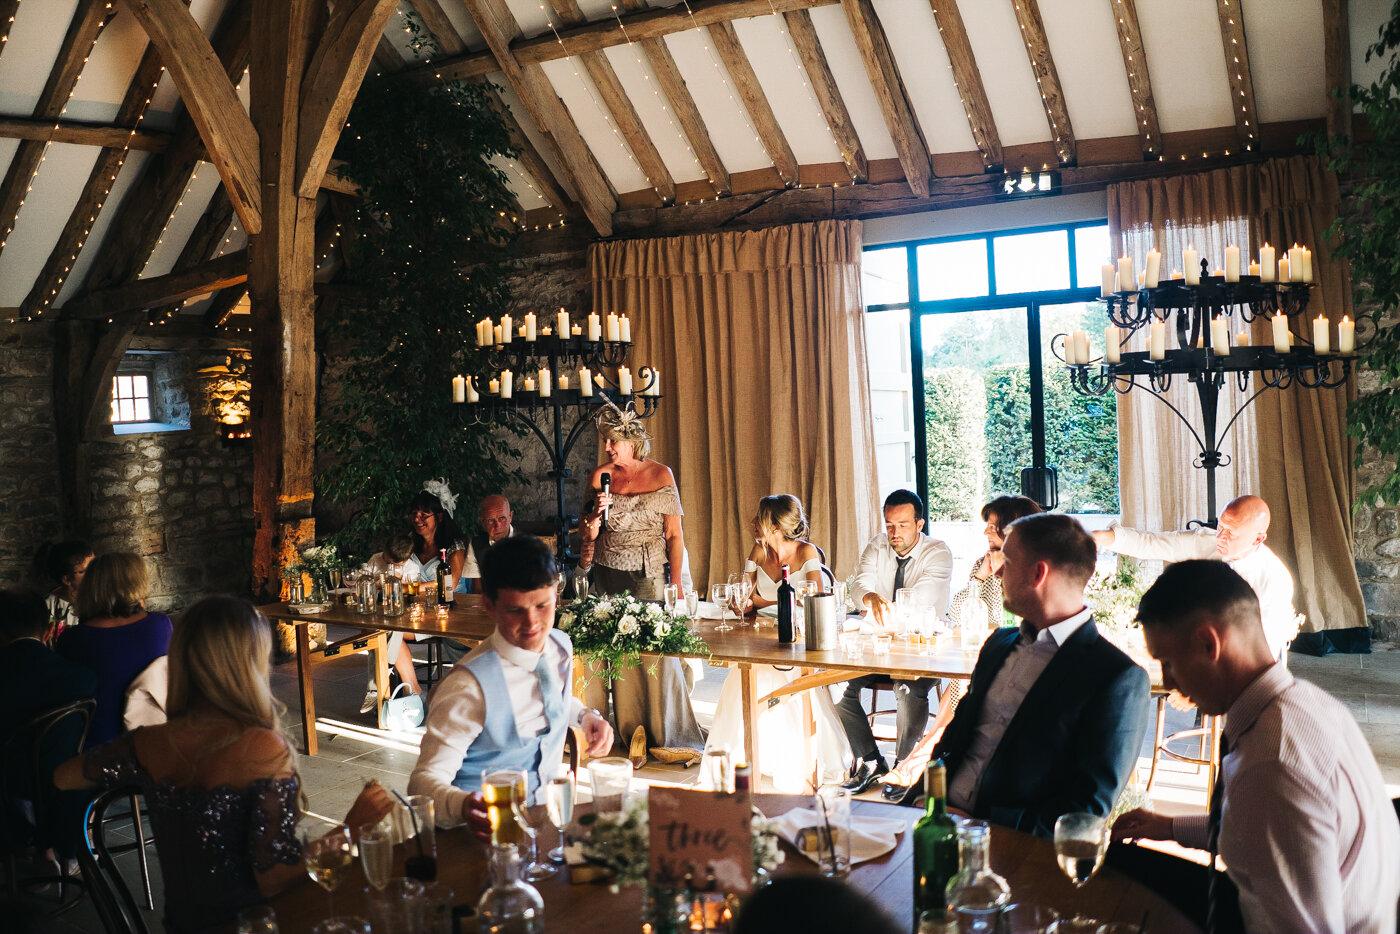 tithe-barn-bolton-abbey-north-yorkshire-cripps-wedding-photographer-creative-0045.jpg